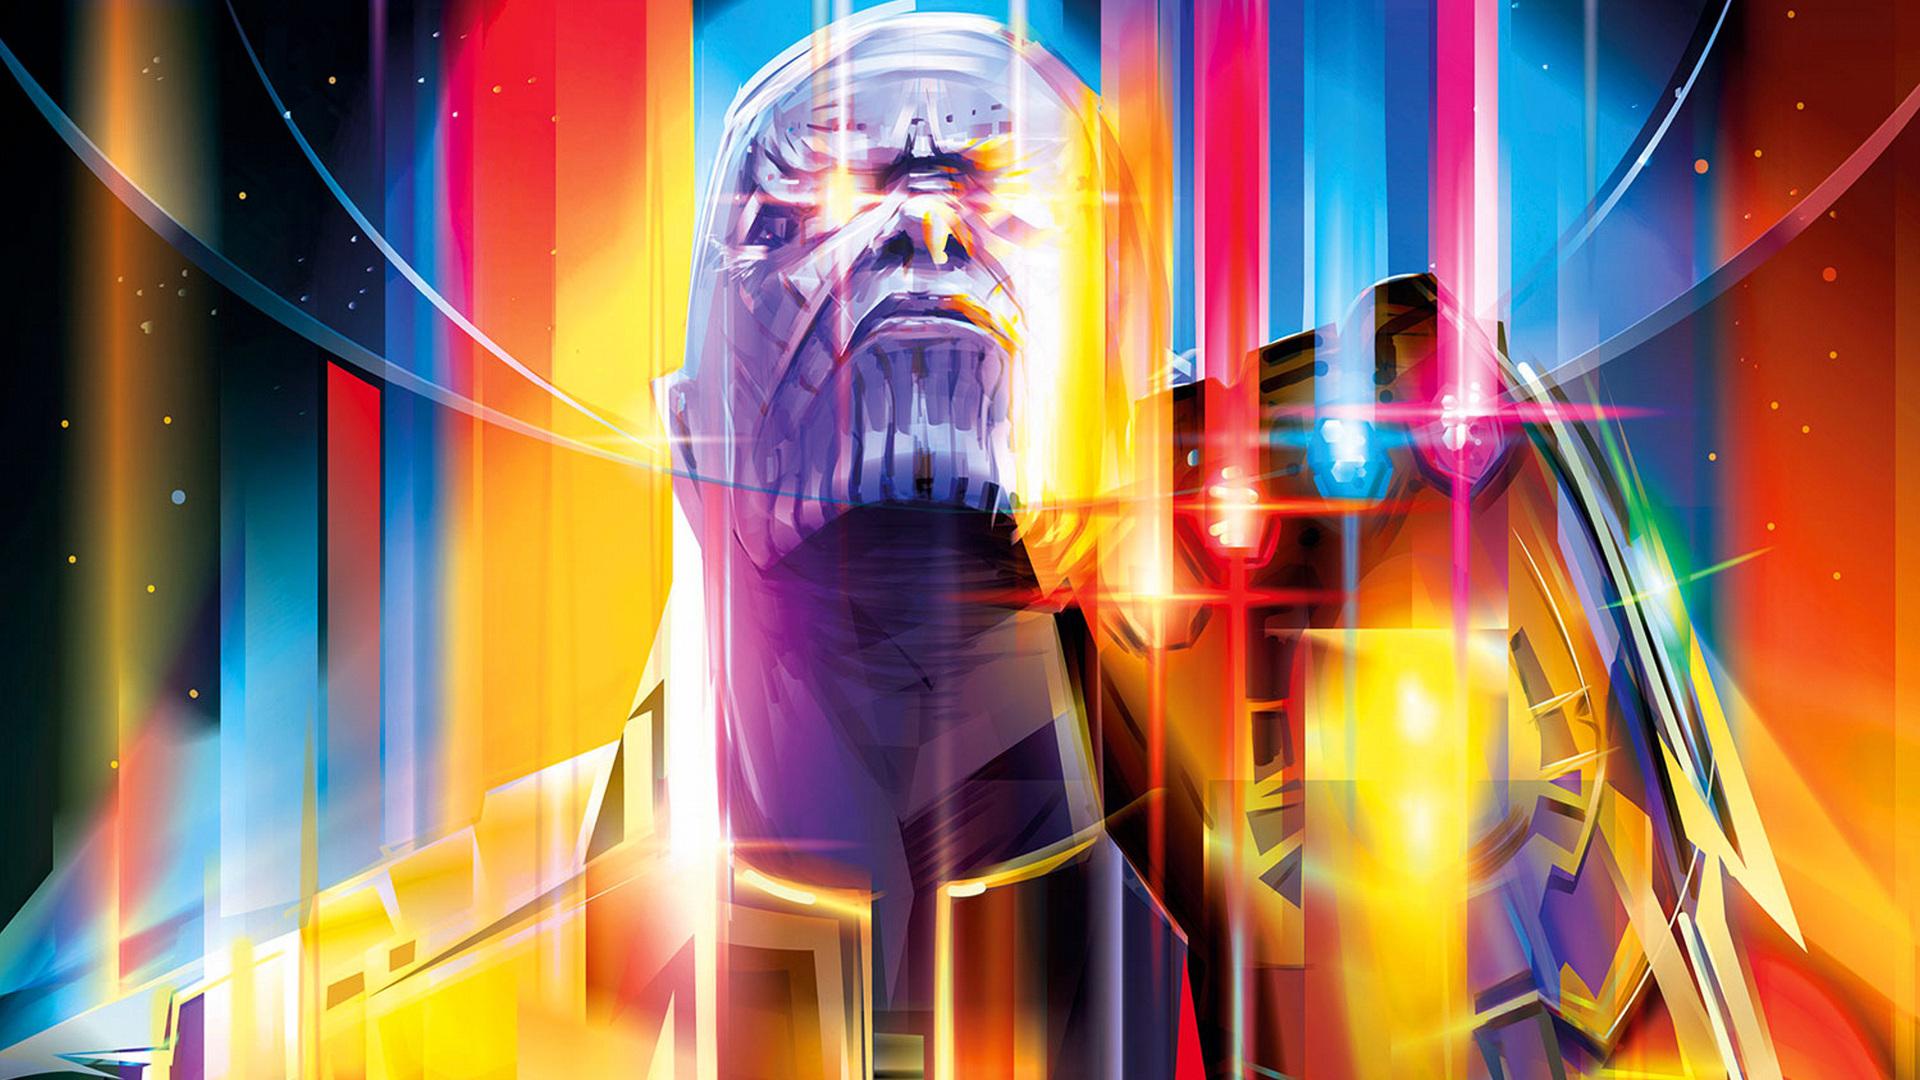 1920x1080 Thanos Avengers Infinity War 2018 Empire Laptop Full Hd